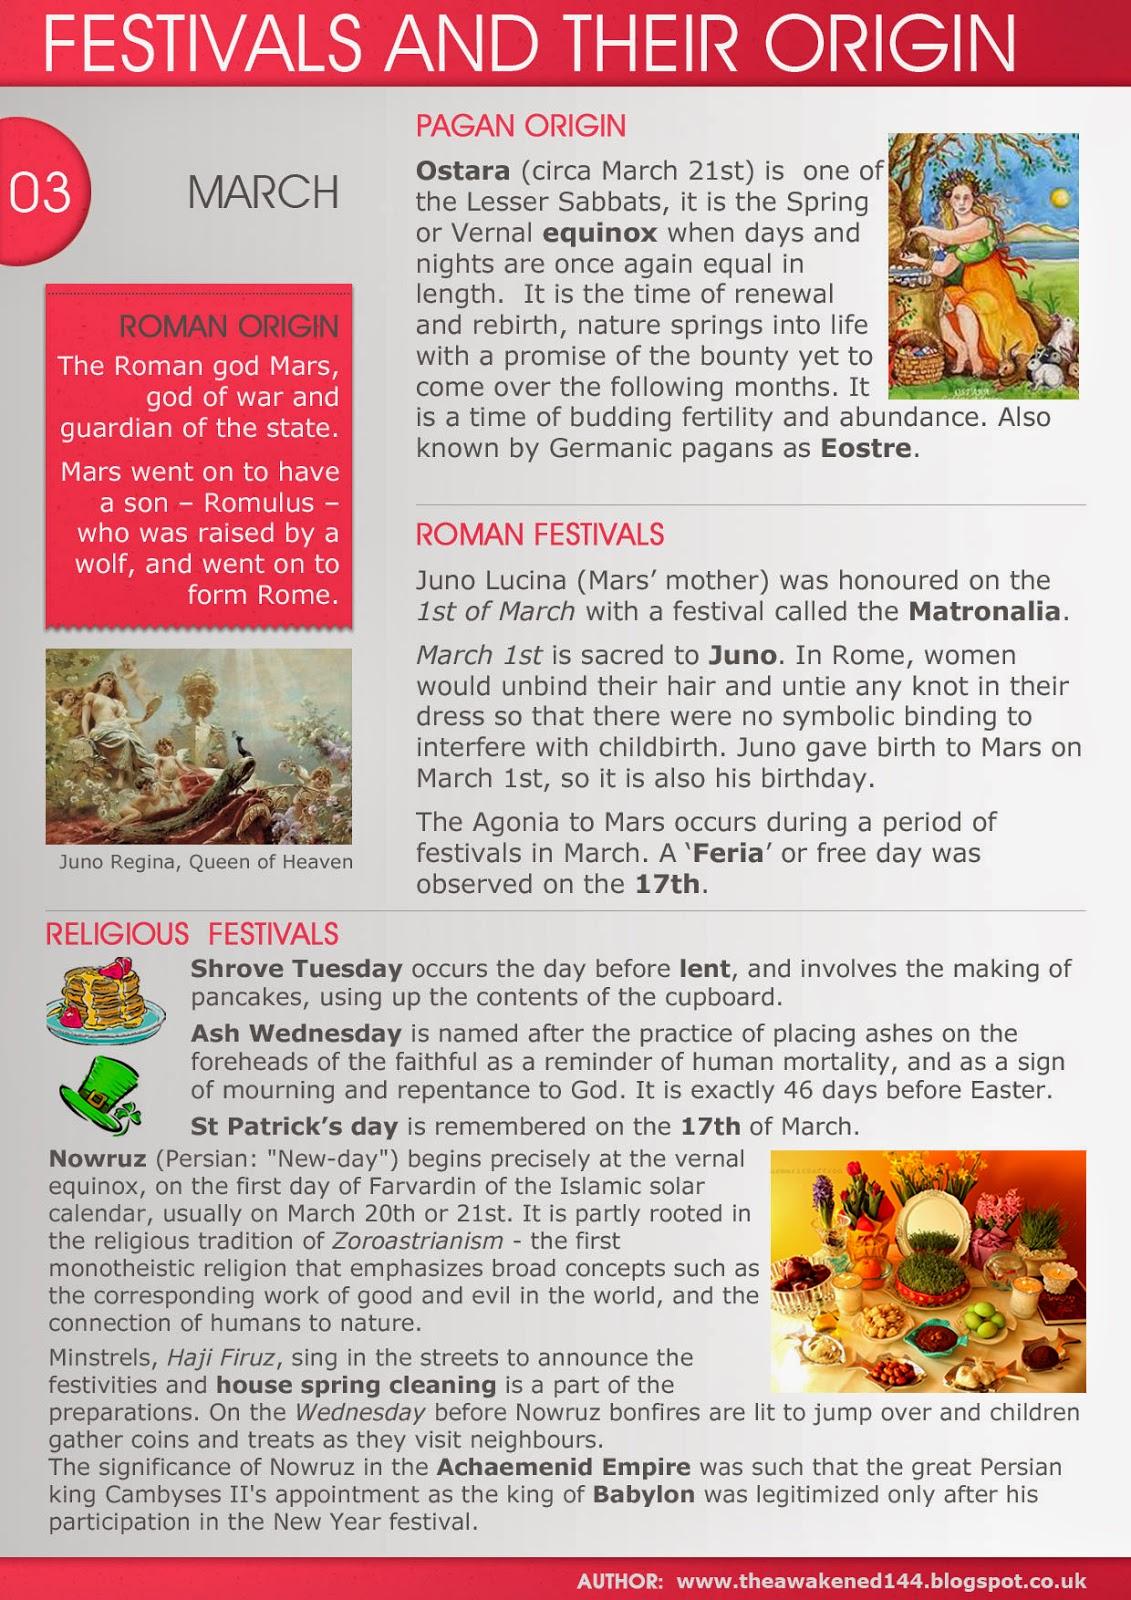 Festivals and Their Origin - March: Roman Origin and Festivals, Pagan Festivals and Modern Time Religious Celebrations